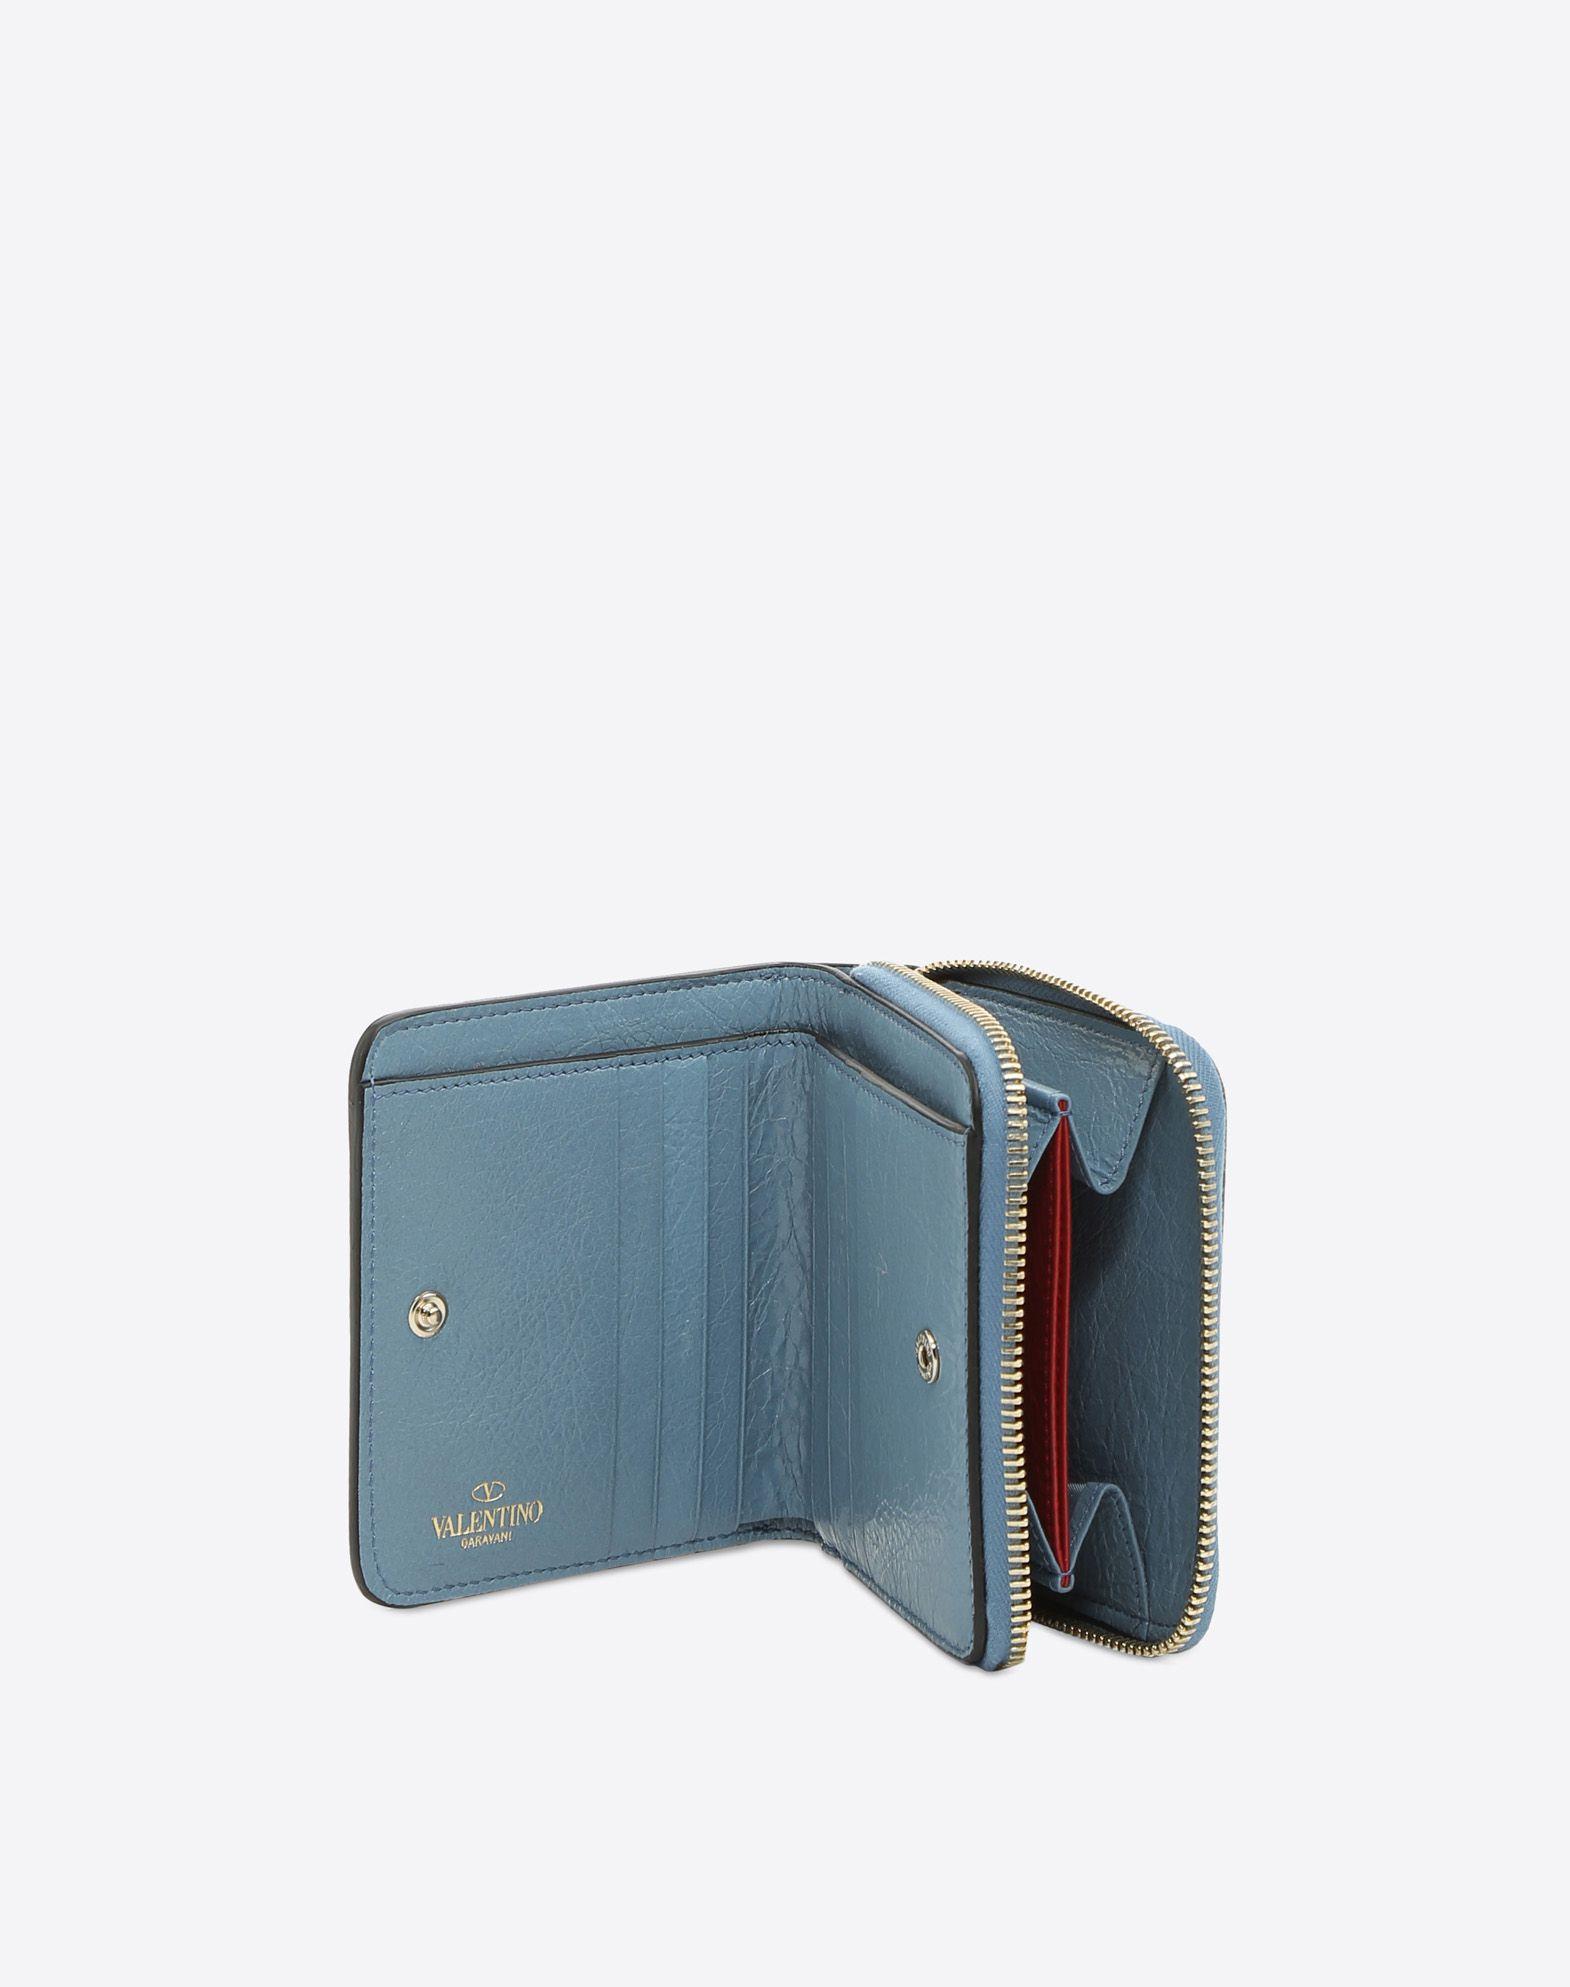 VALENTINO GARAVANI Rockstud Spike Compact 皮夹 便携钱包 D a